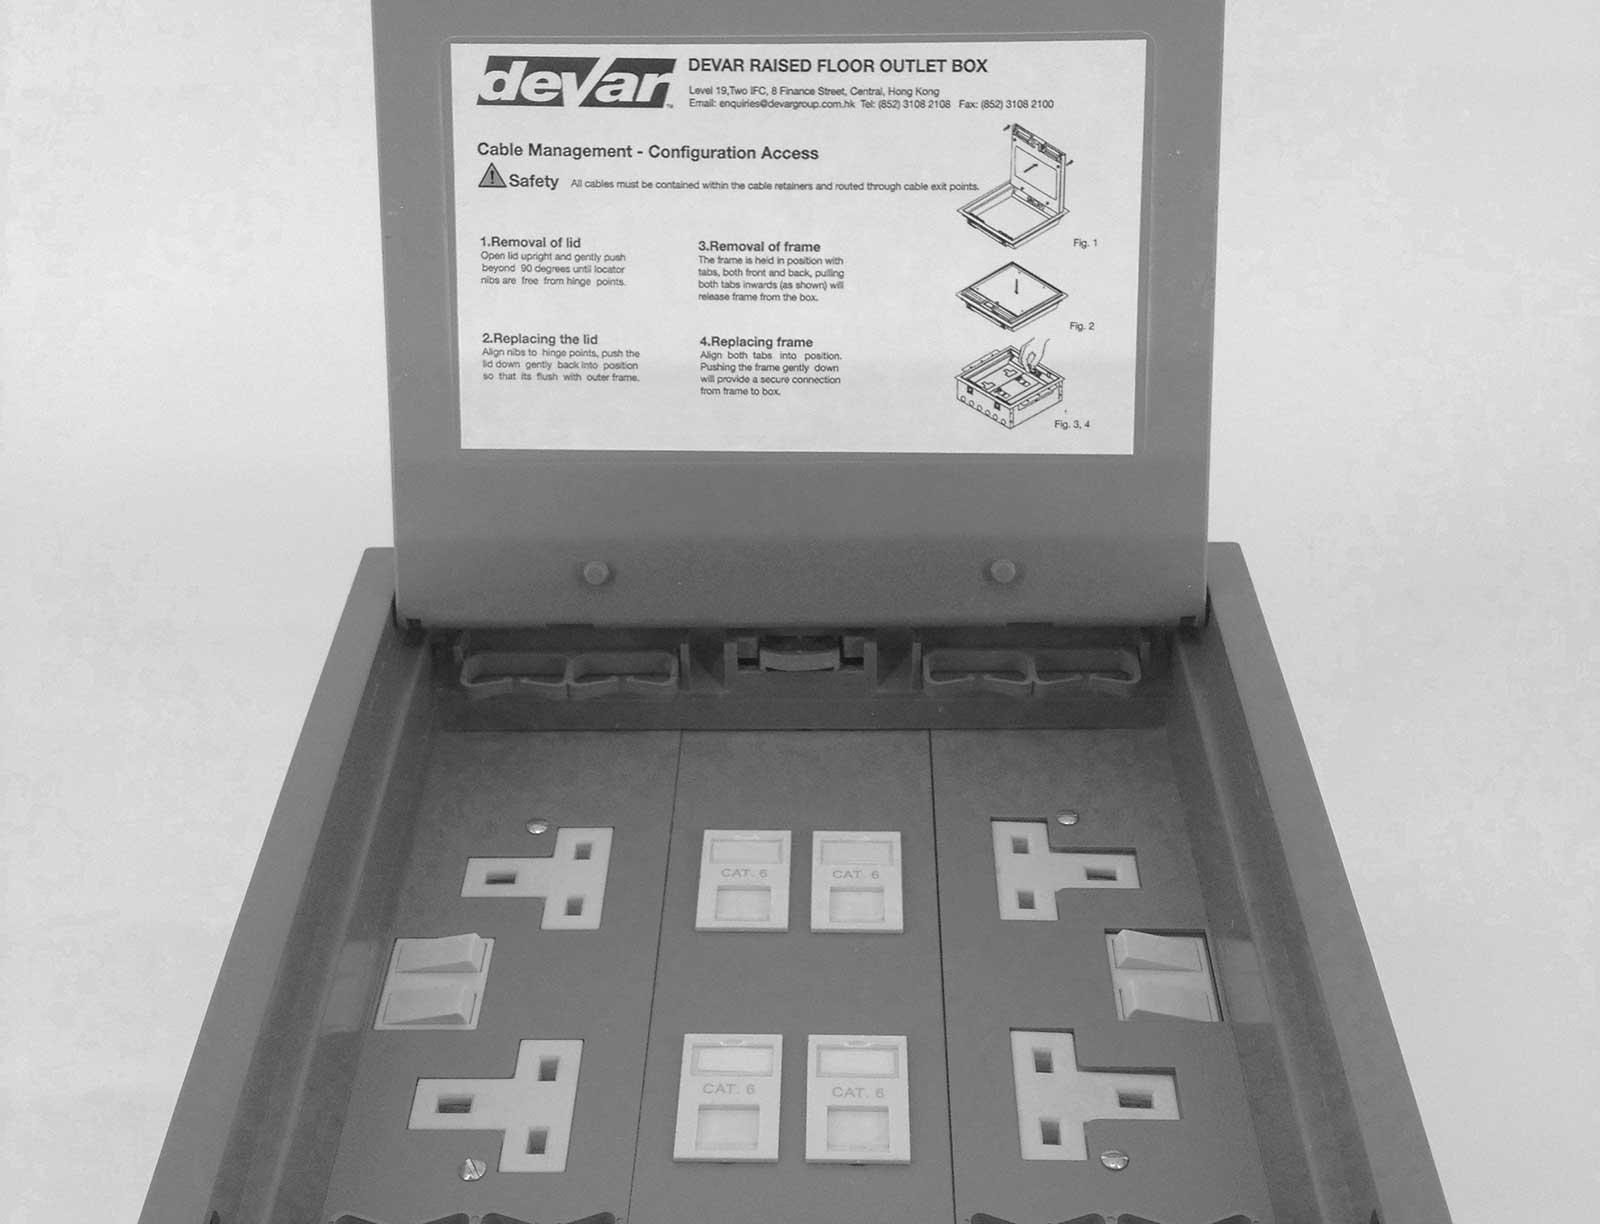 Raised Floor Outlet Box Devar 2